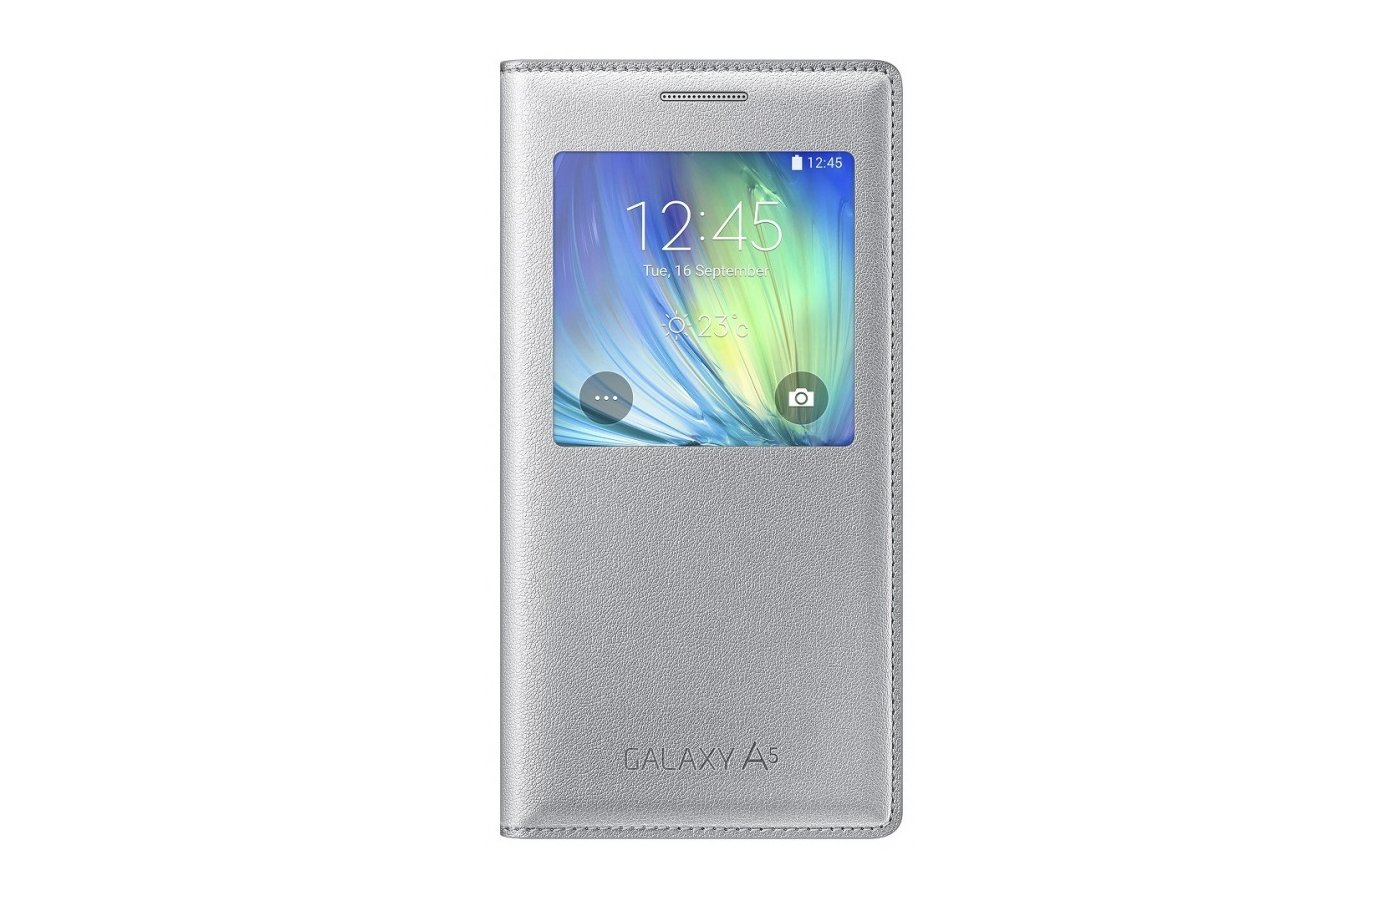 Чехол Samsung S-View для Galaxy A5 (SM-A500) (EF-CA500BSEGRU) silver